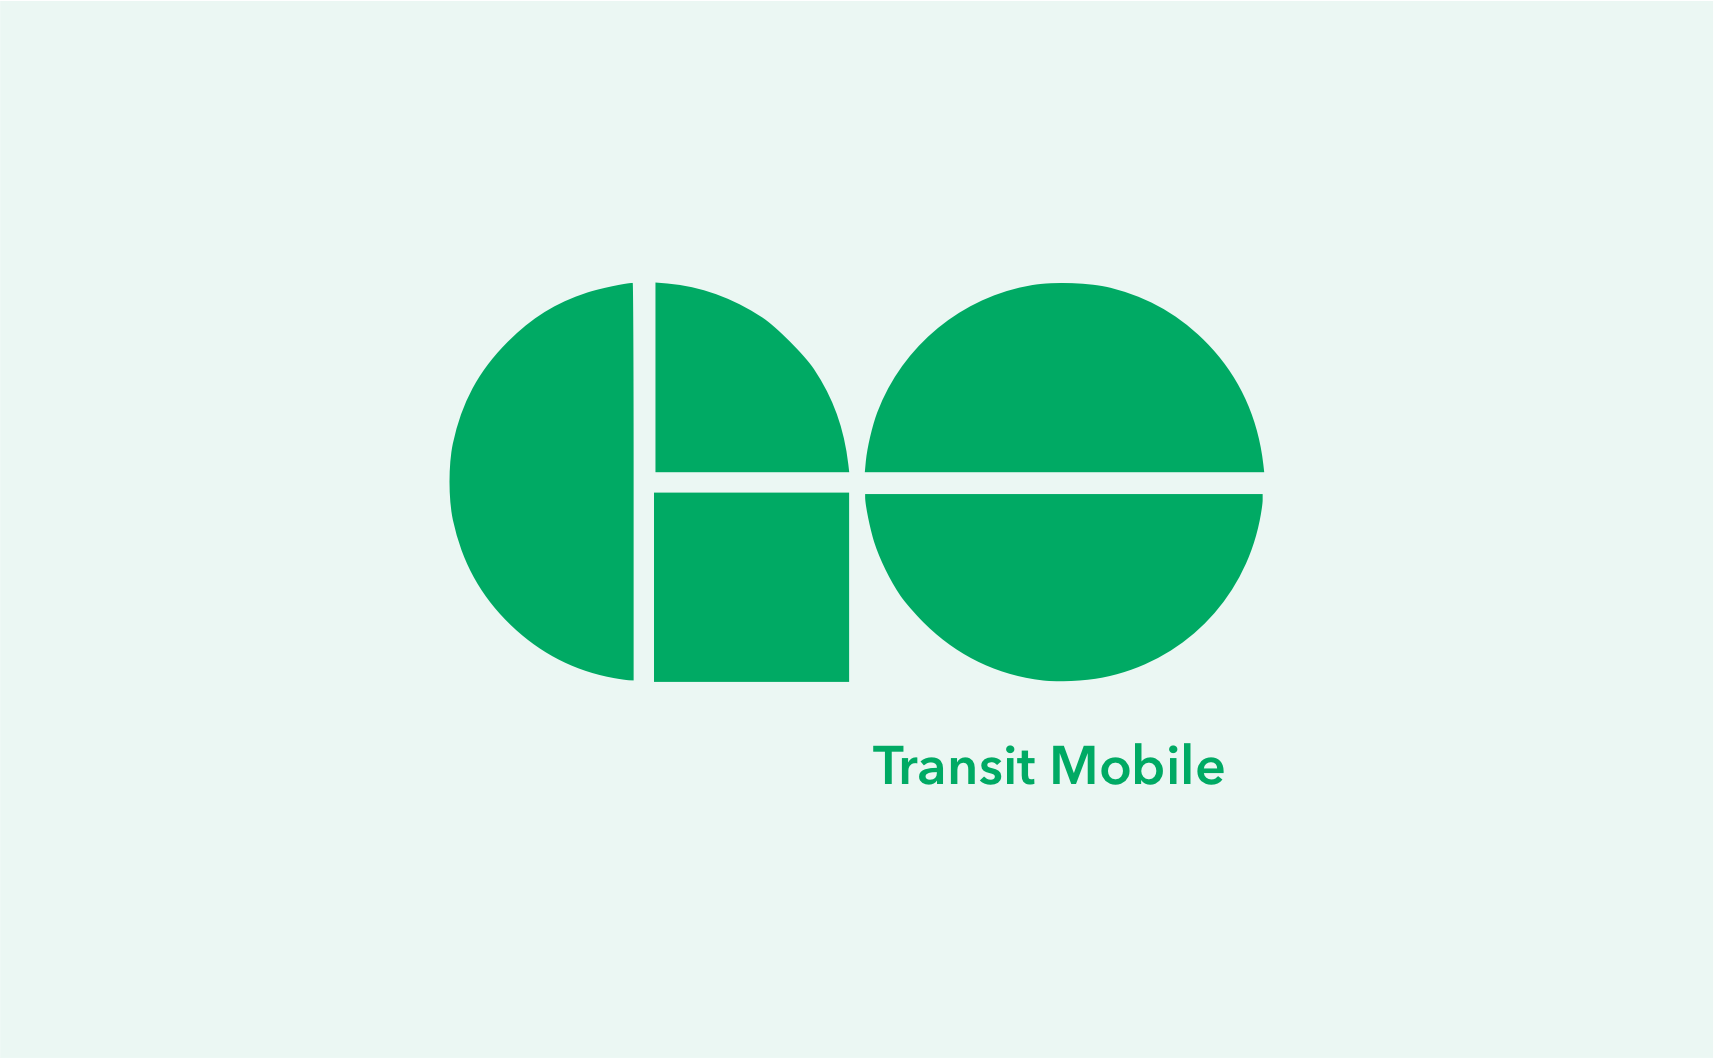 GO TRANSIT MOBILE USABILITY TESTING